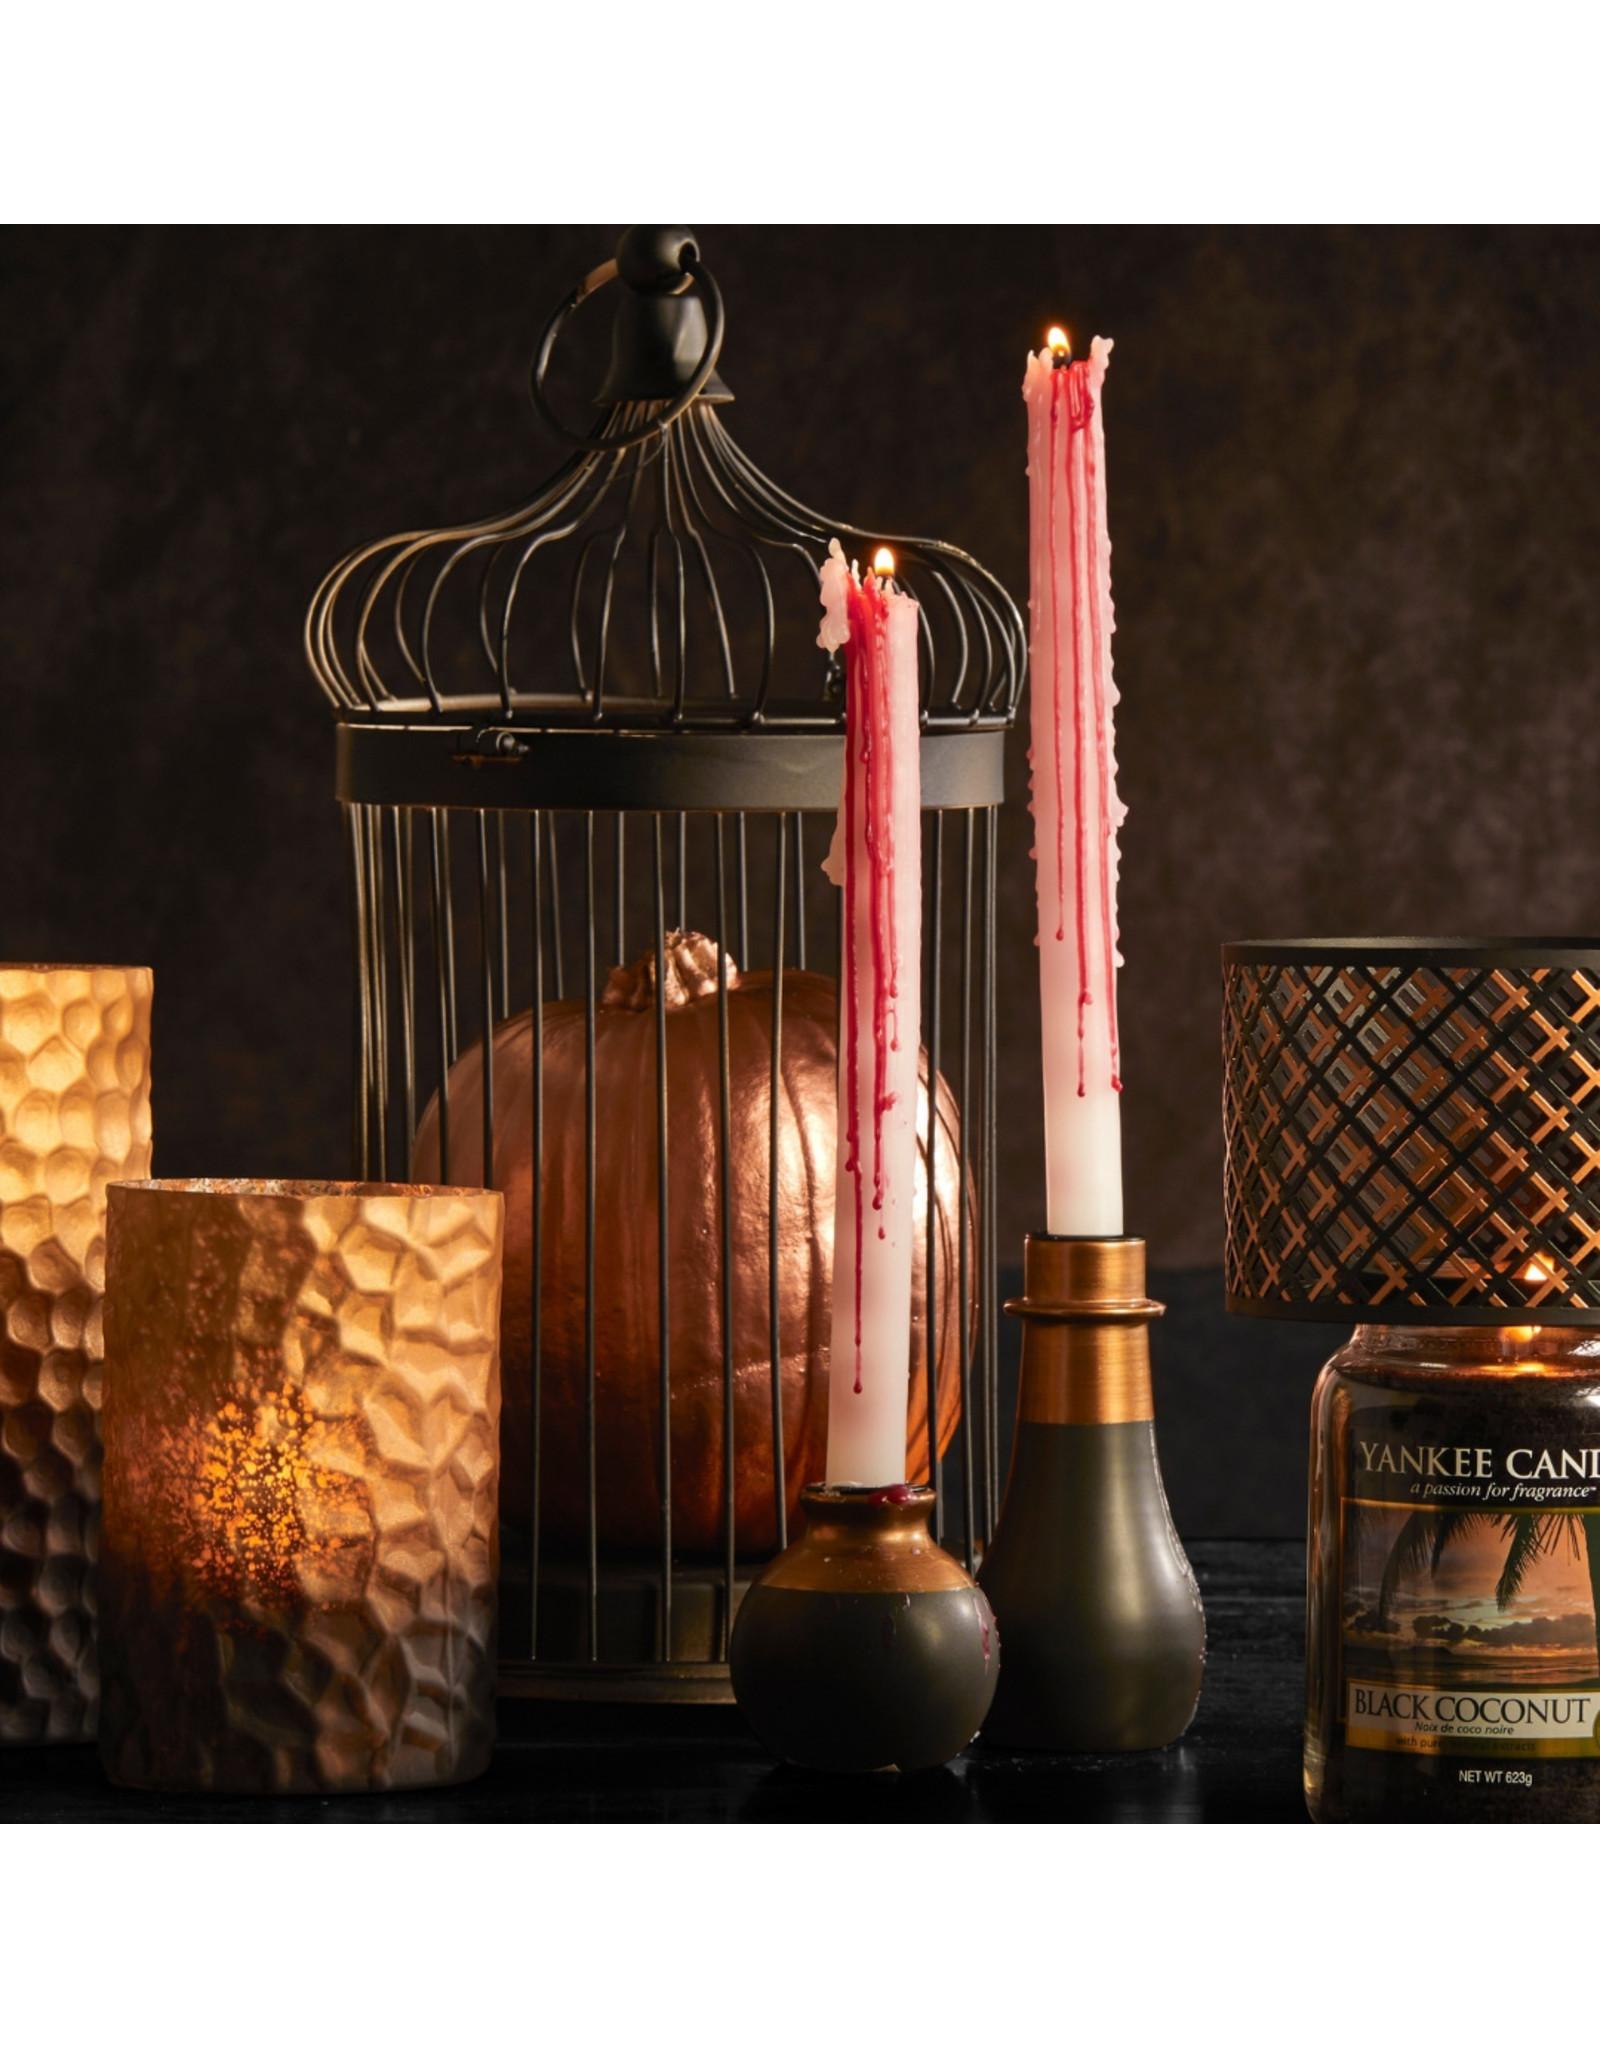 Yankee Candle Halloween Set - Dreadful Drip